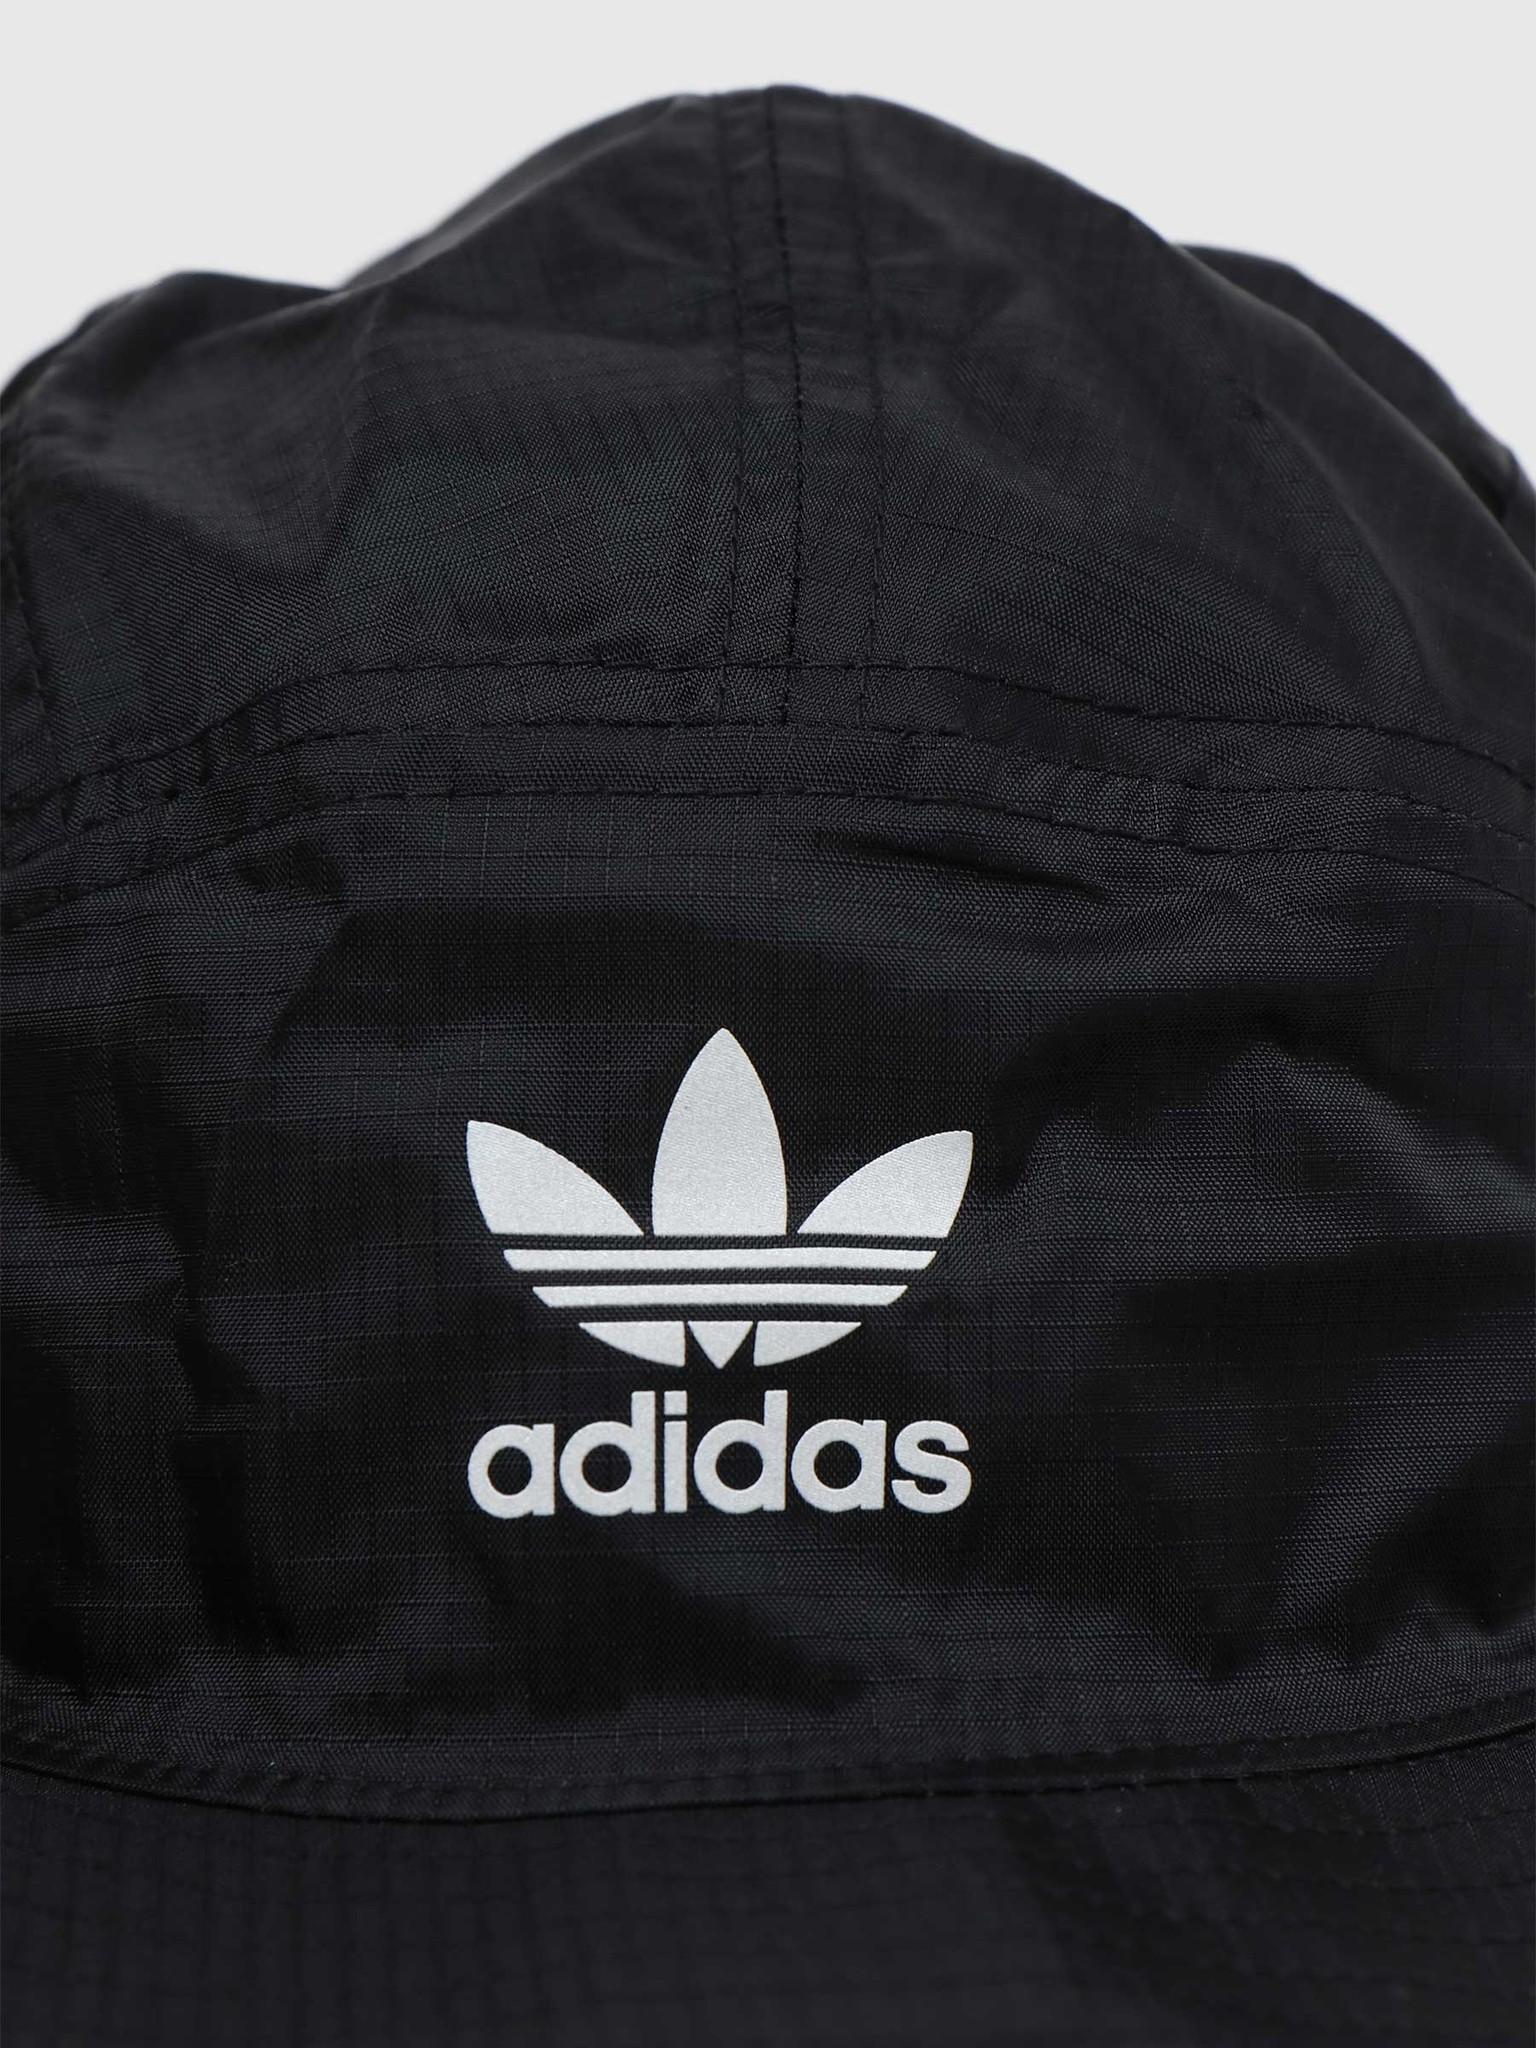 adidas adidas U Tech Boonie Black White GD4448